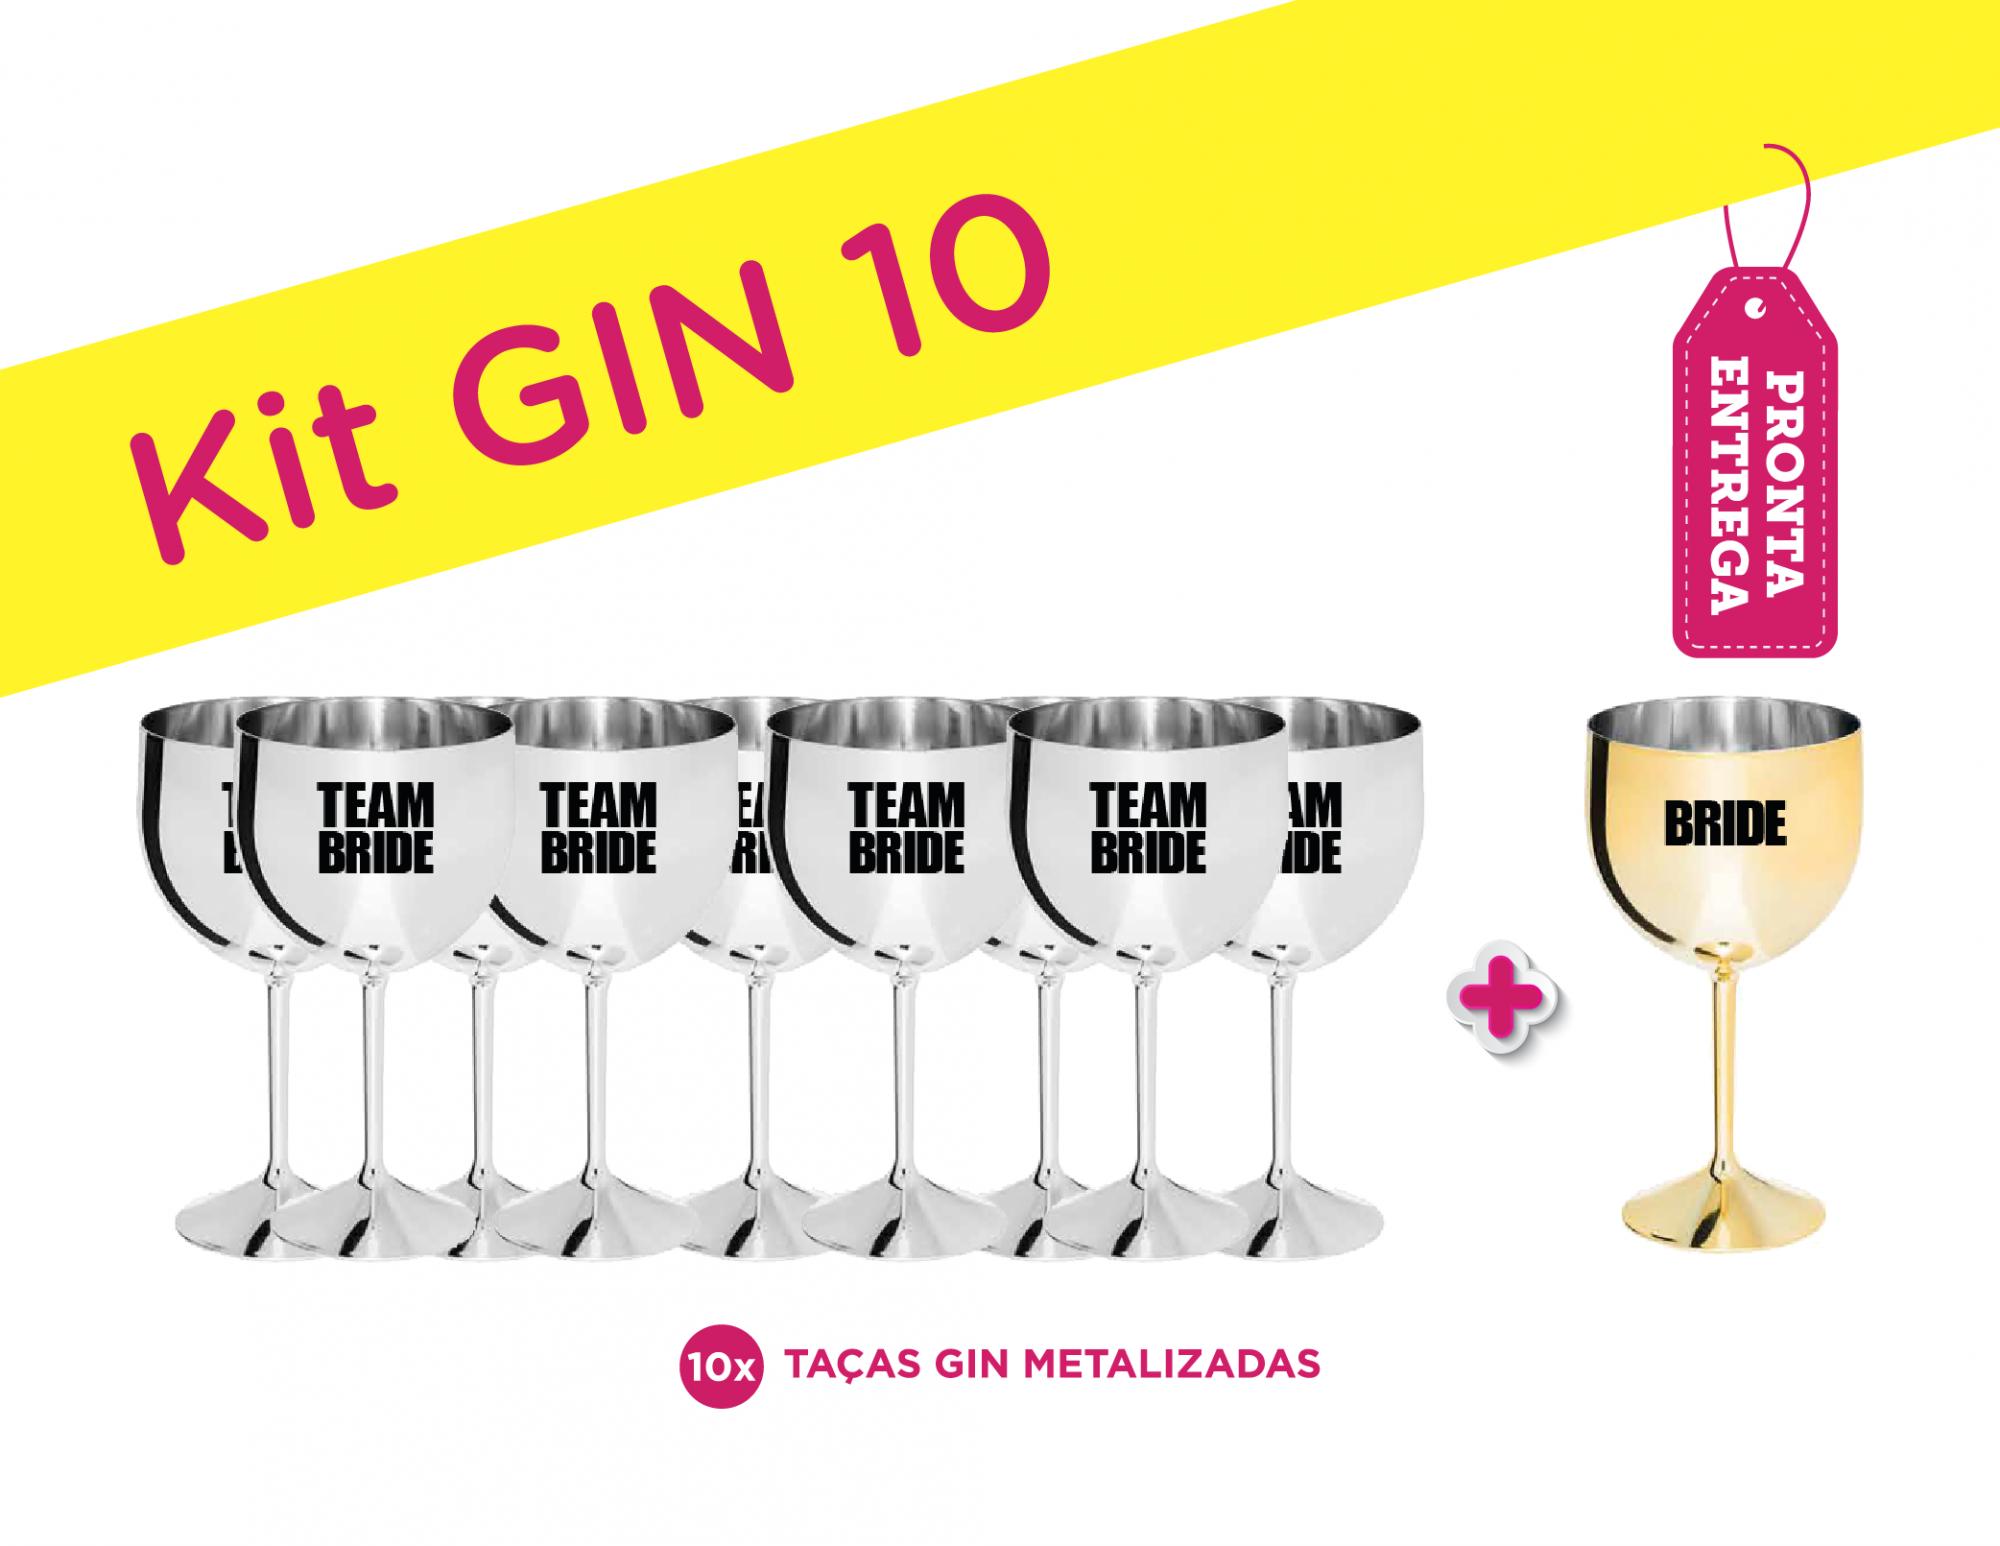 Kit Gin 10 Metalizado Bride/Team Bride Pronta Entrega para Despedida de Solteira